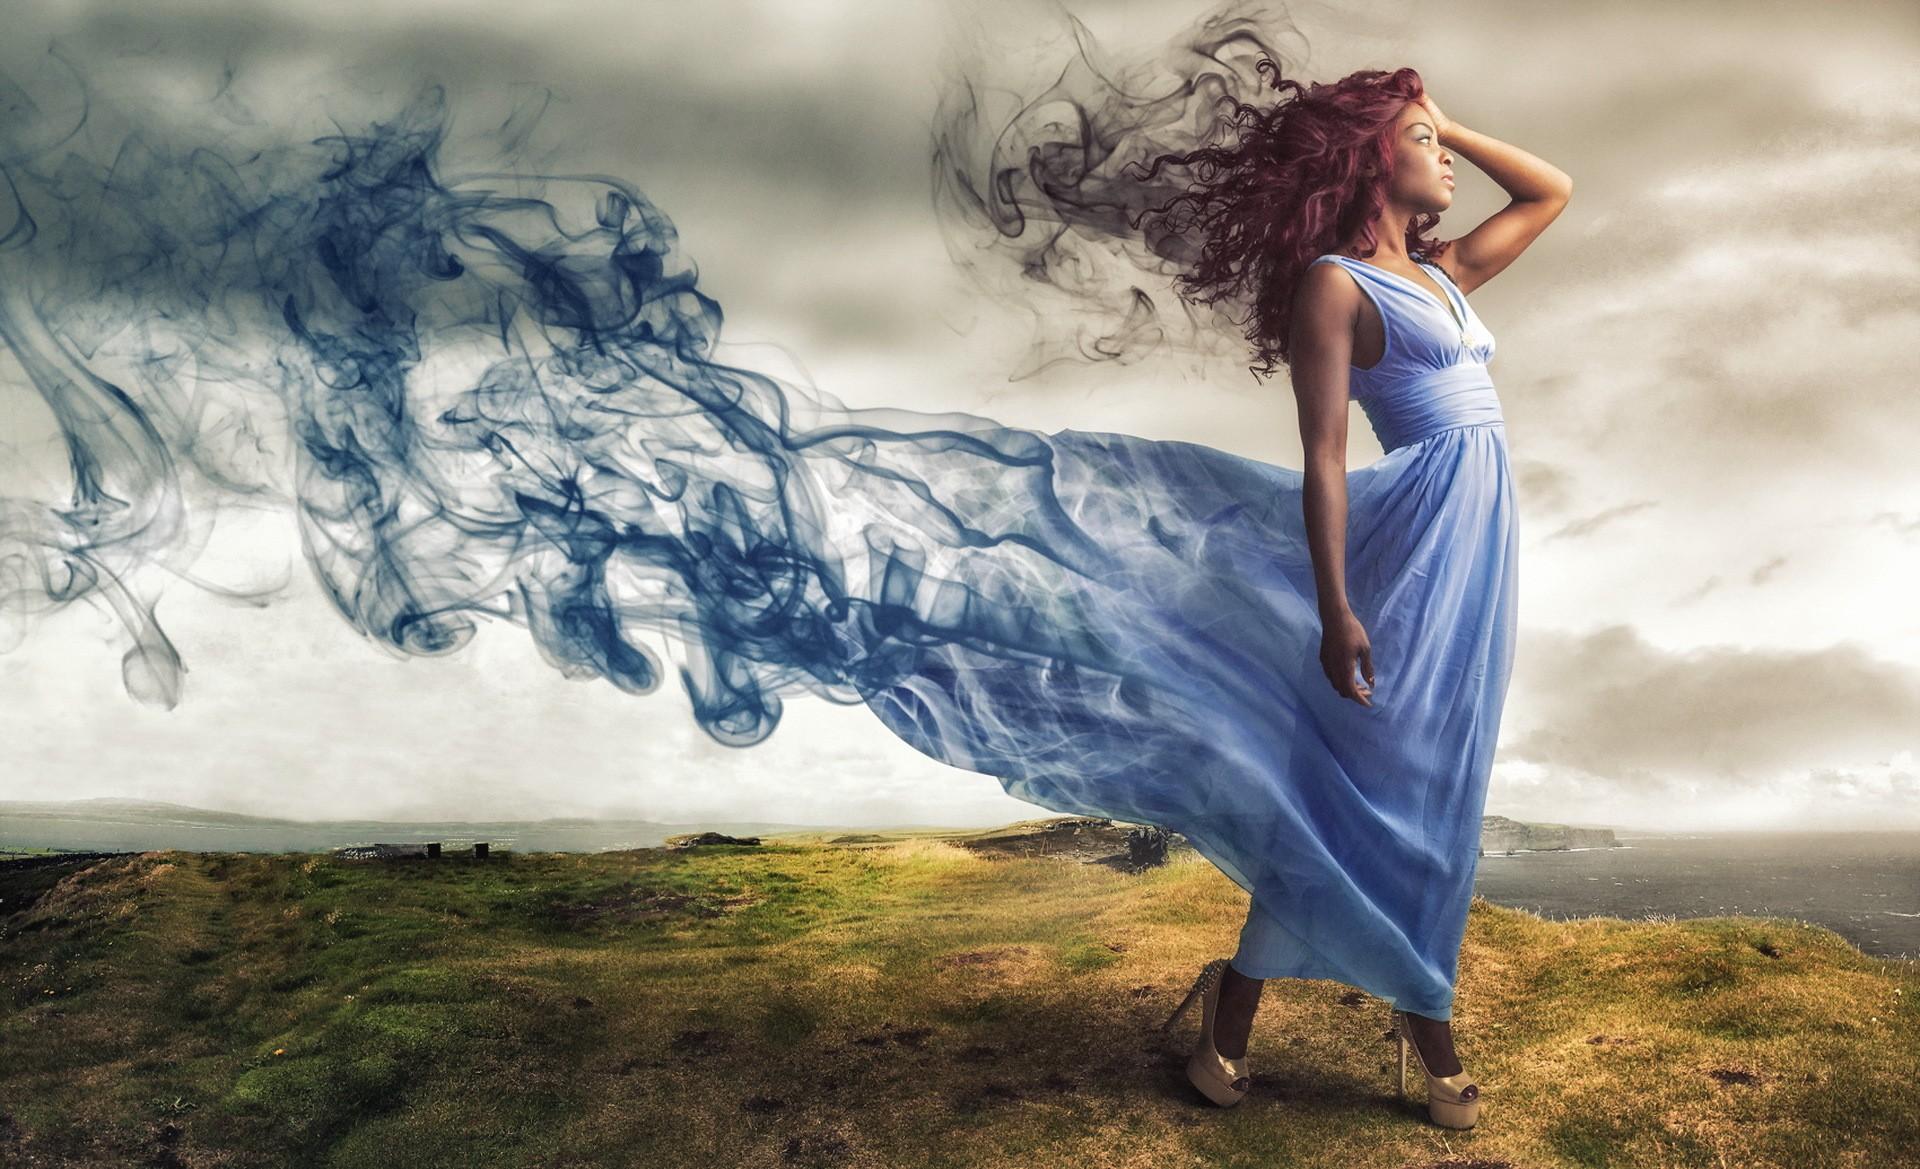 Indian Girl Wallpaper 1080x1920 Dress Manipulation Hd Artist 4k Wallpapers Images